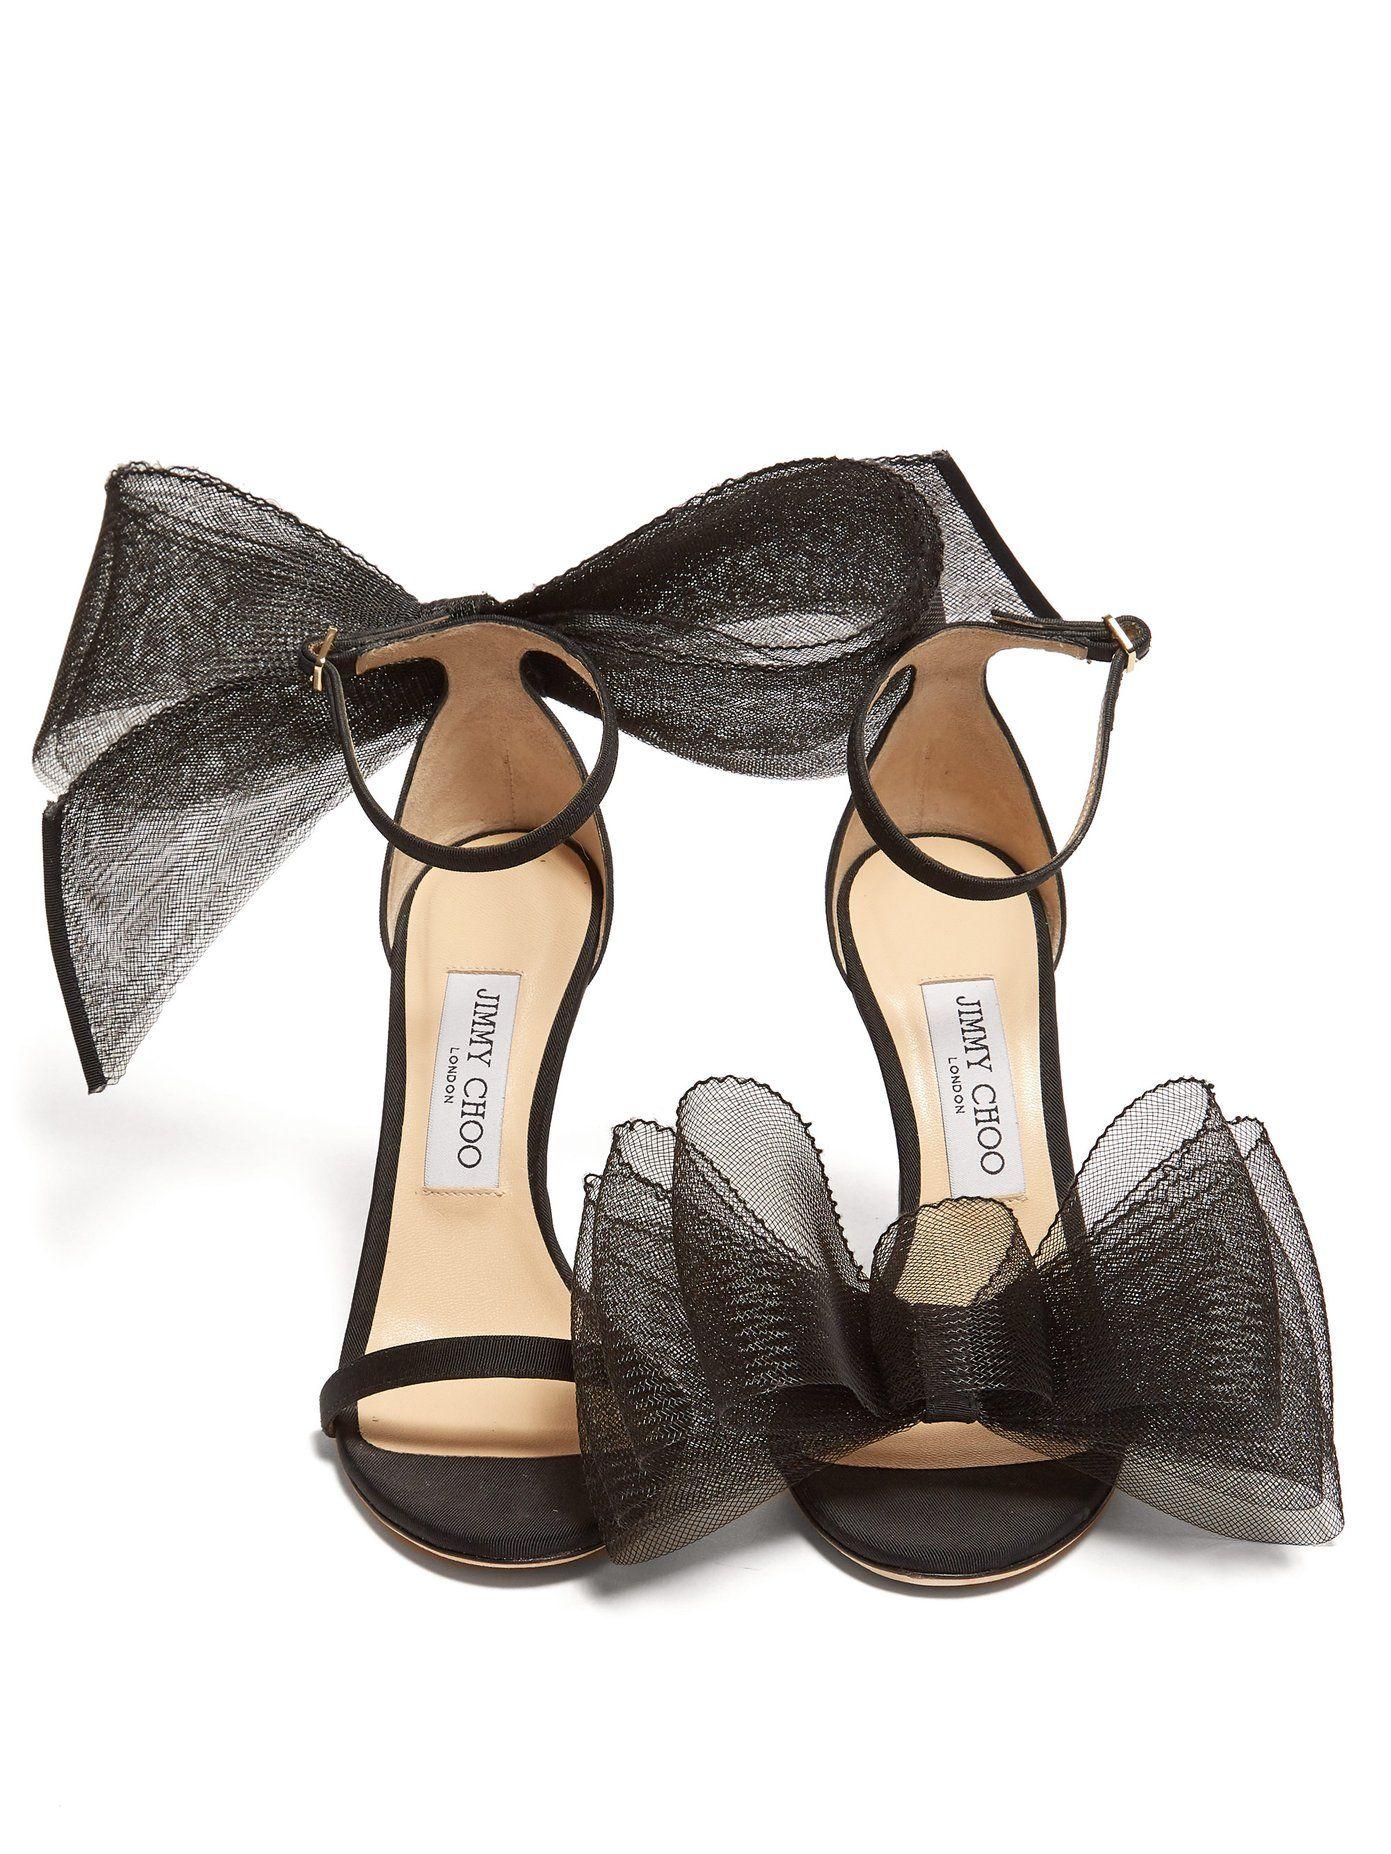 Bow sandals, Jimmy choo heels, Fashion